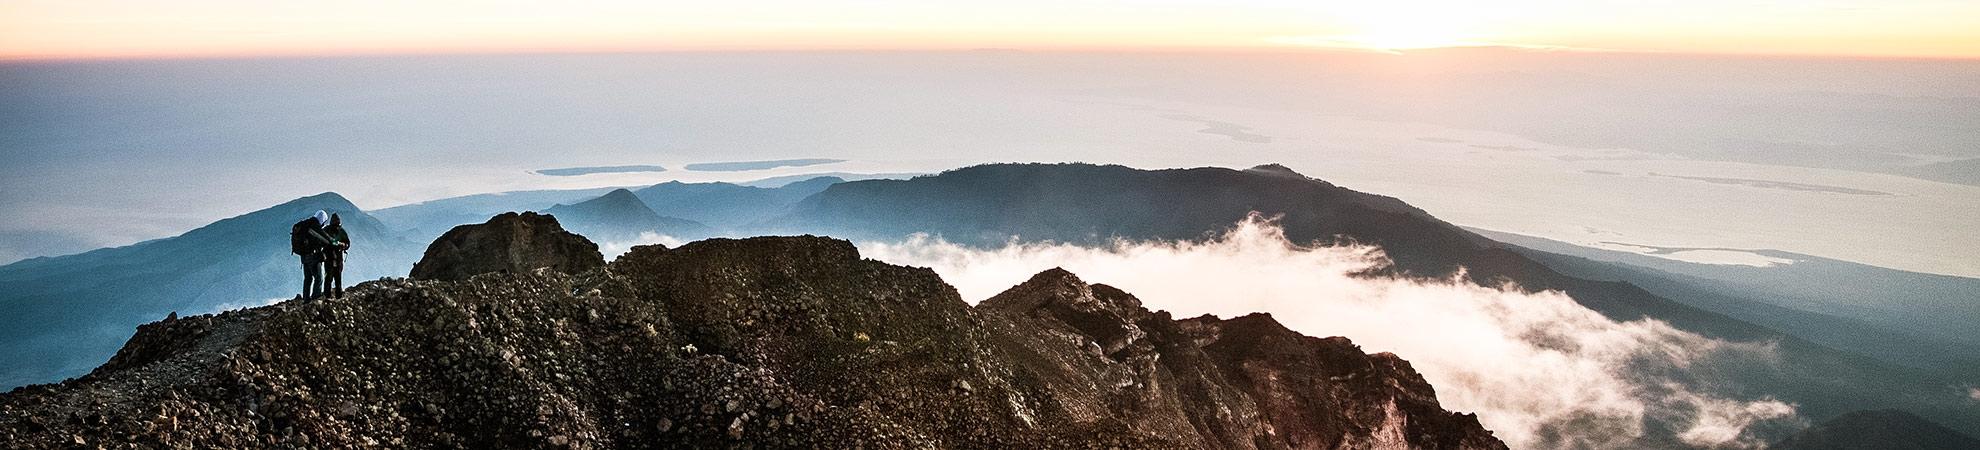 Voyage Mont Rinjani